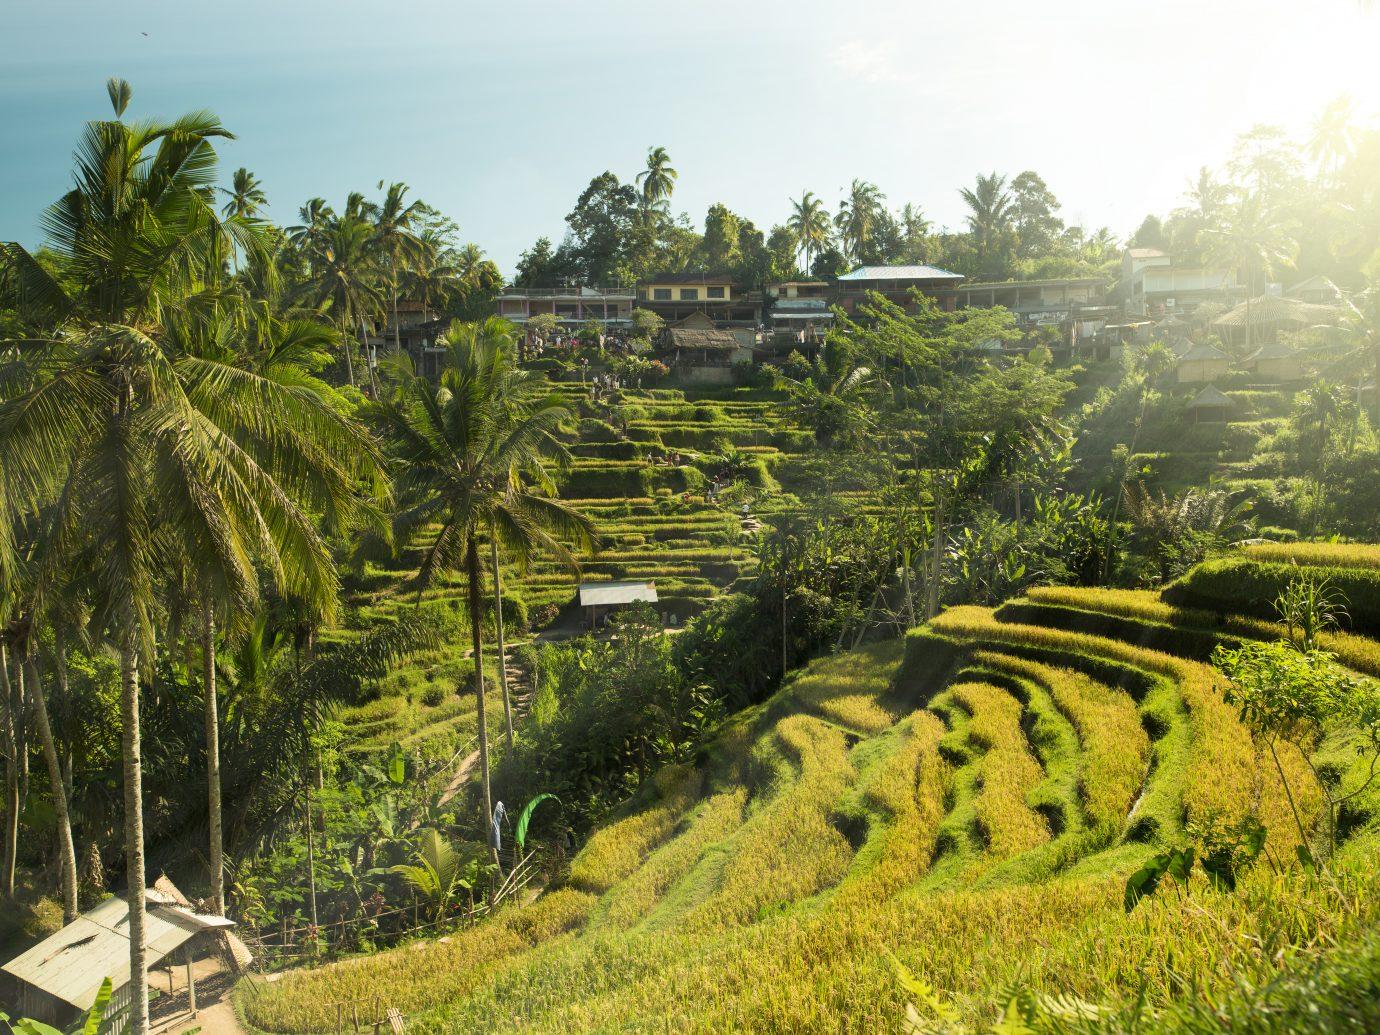 Beautiful rice terraces in the morning light near Tegallalang village, Ubud, Bali